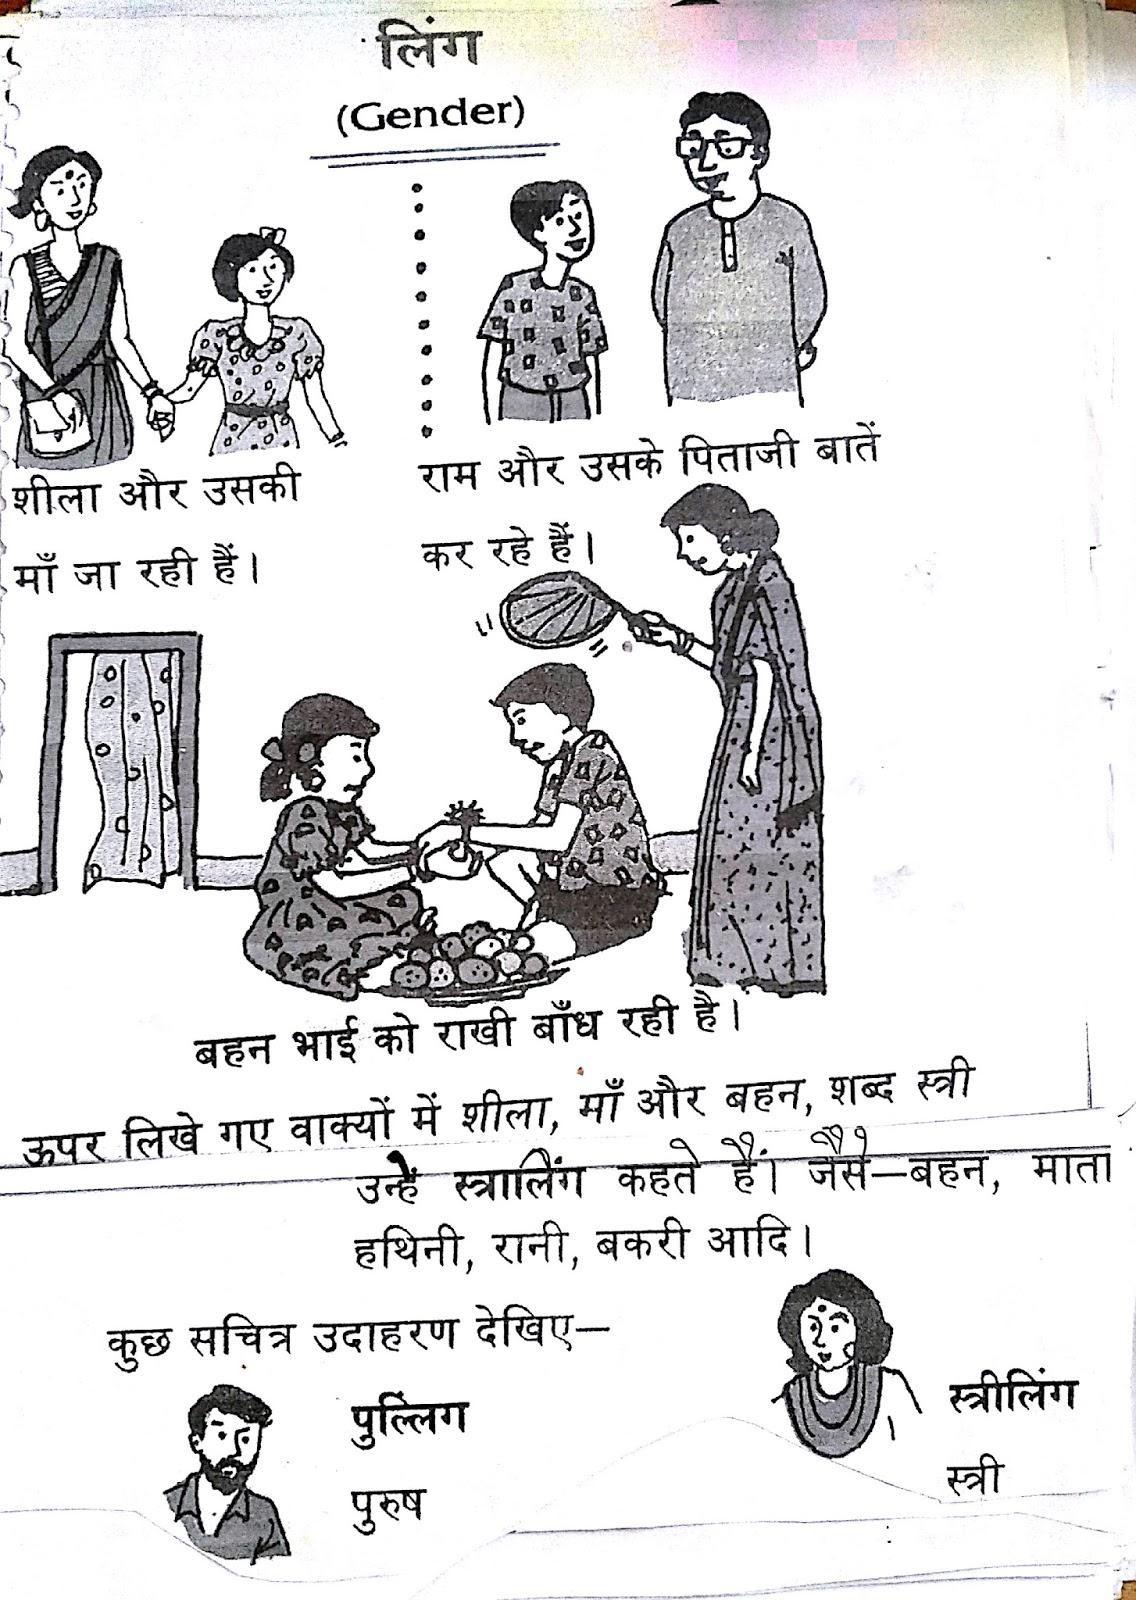 Workbooks hindi gender worksheets : Hindi Grammar Work Sheet Collection for Classes 5,6, 7 & 8: Gender ...